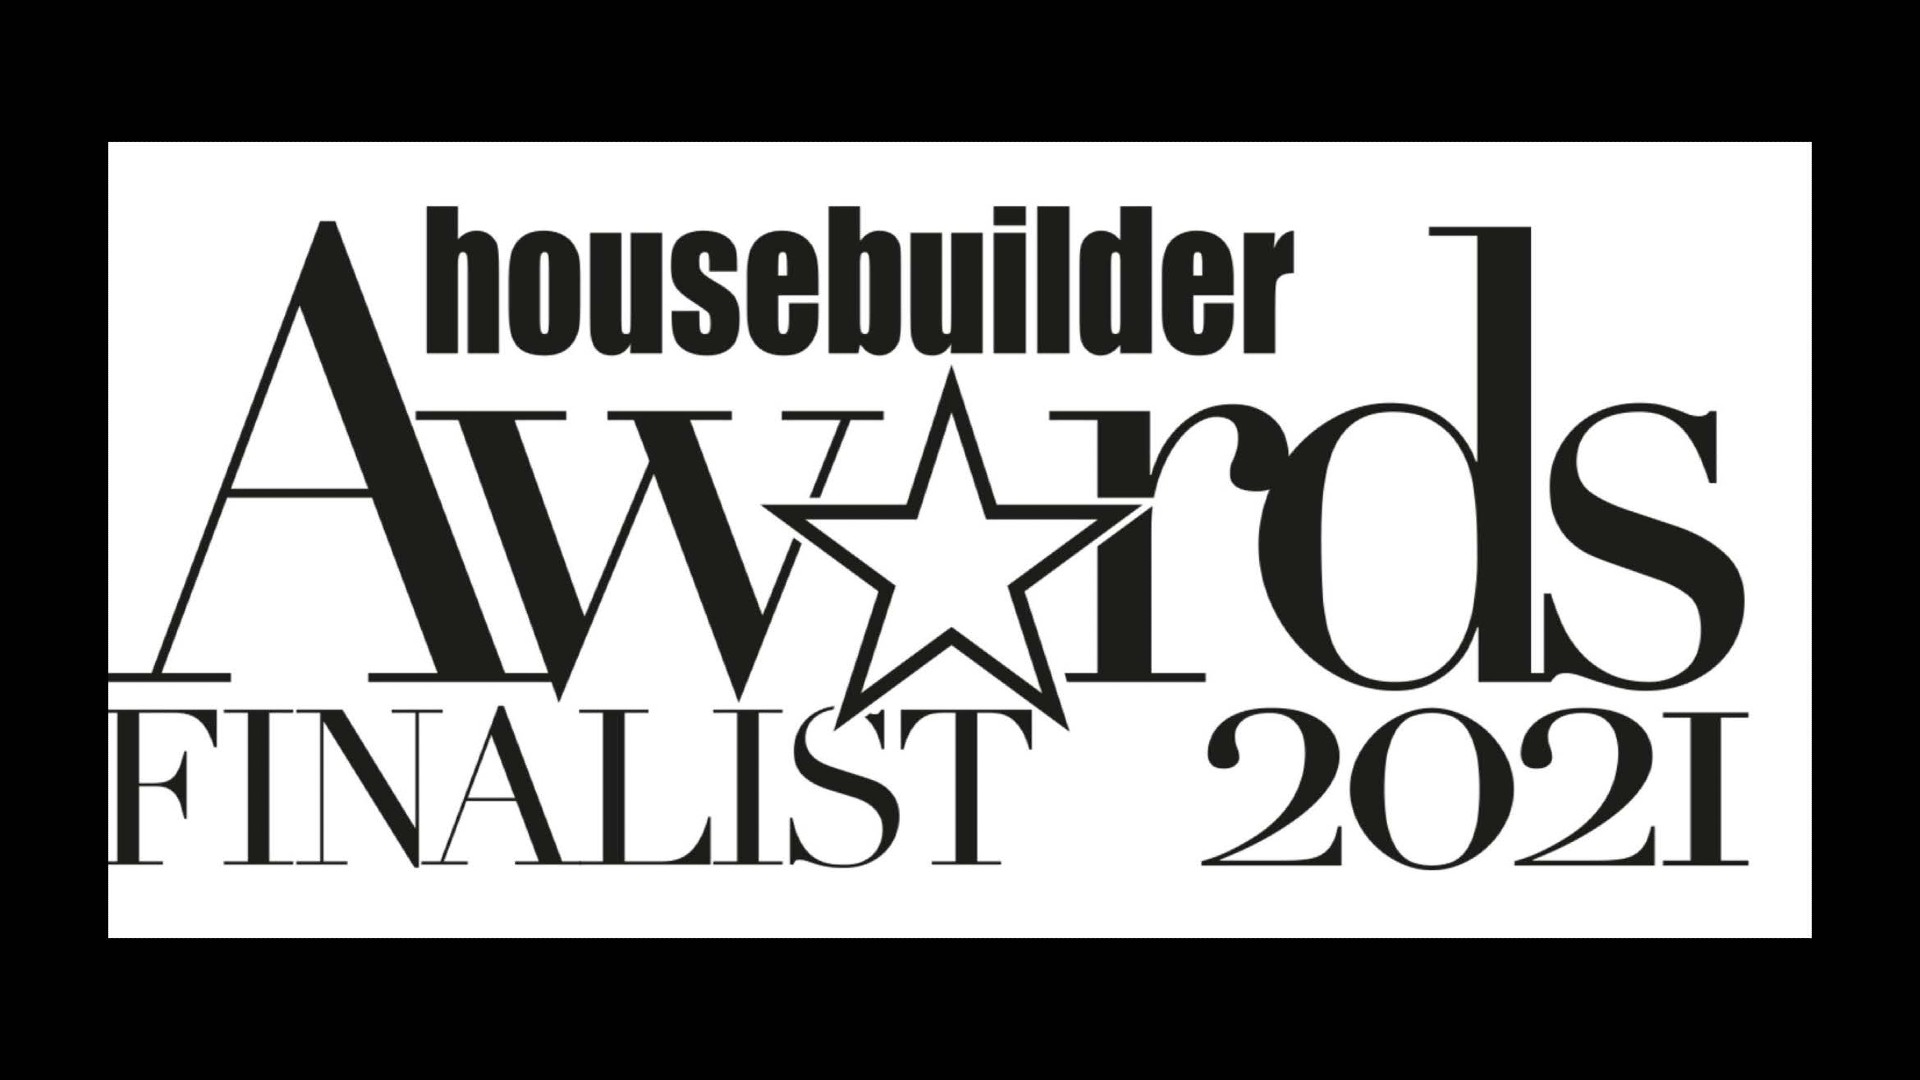 Housebuilder Awards